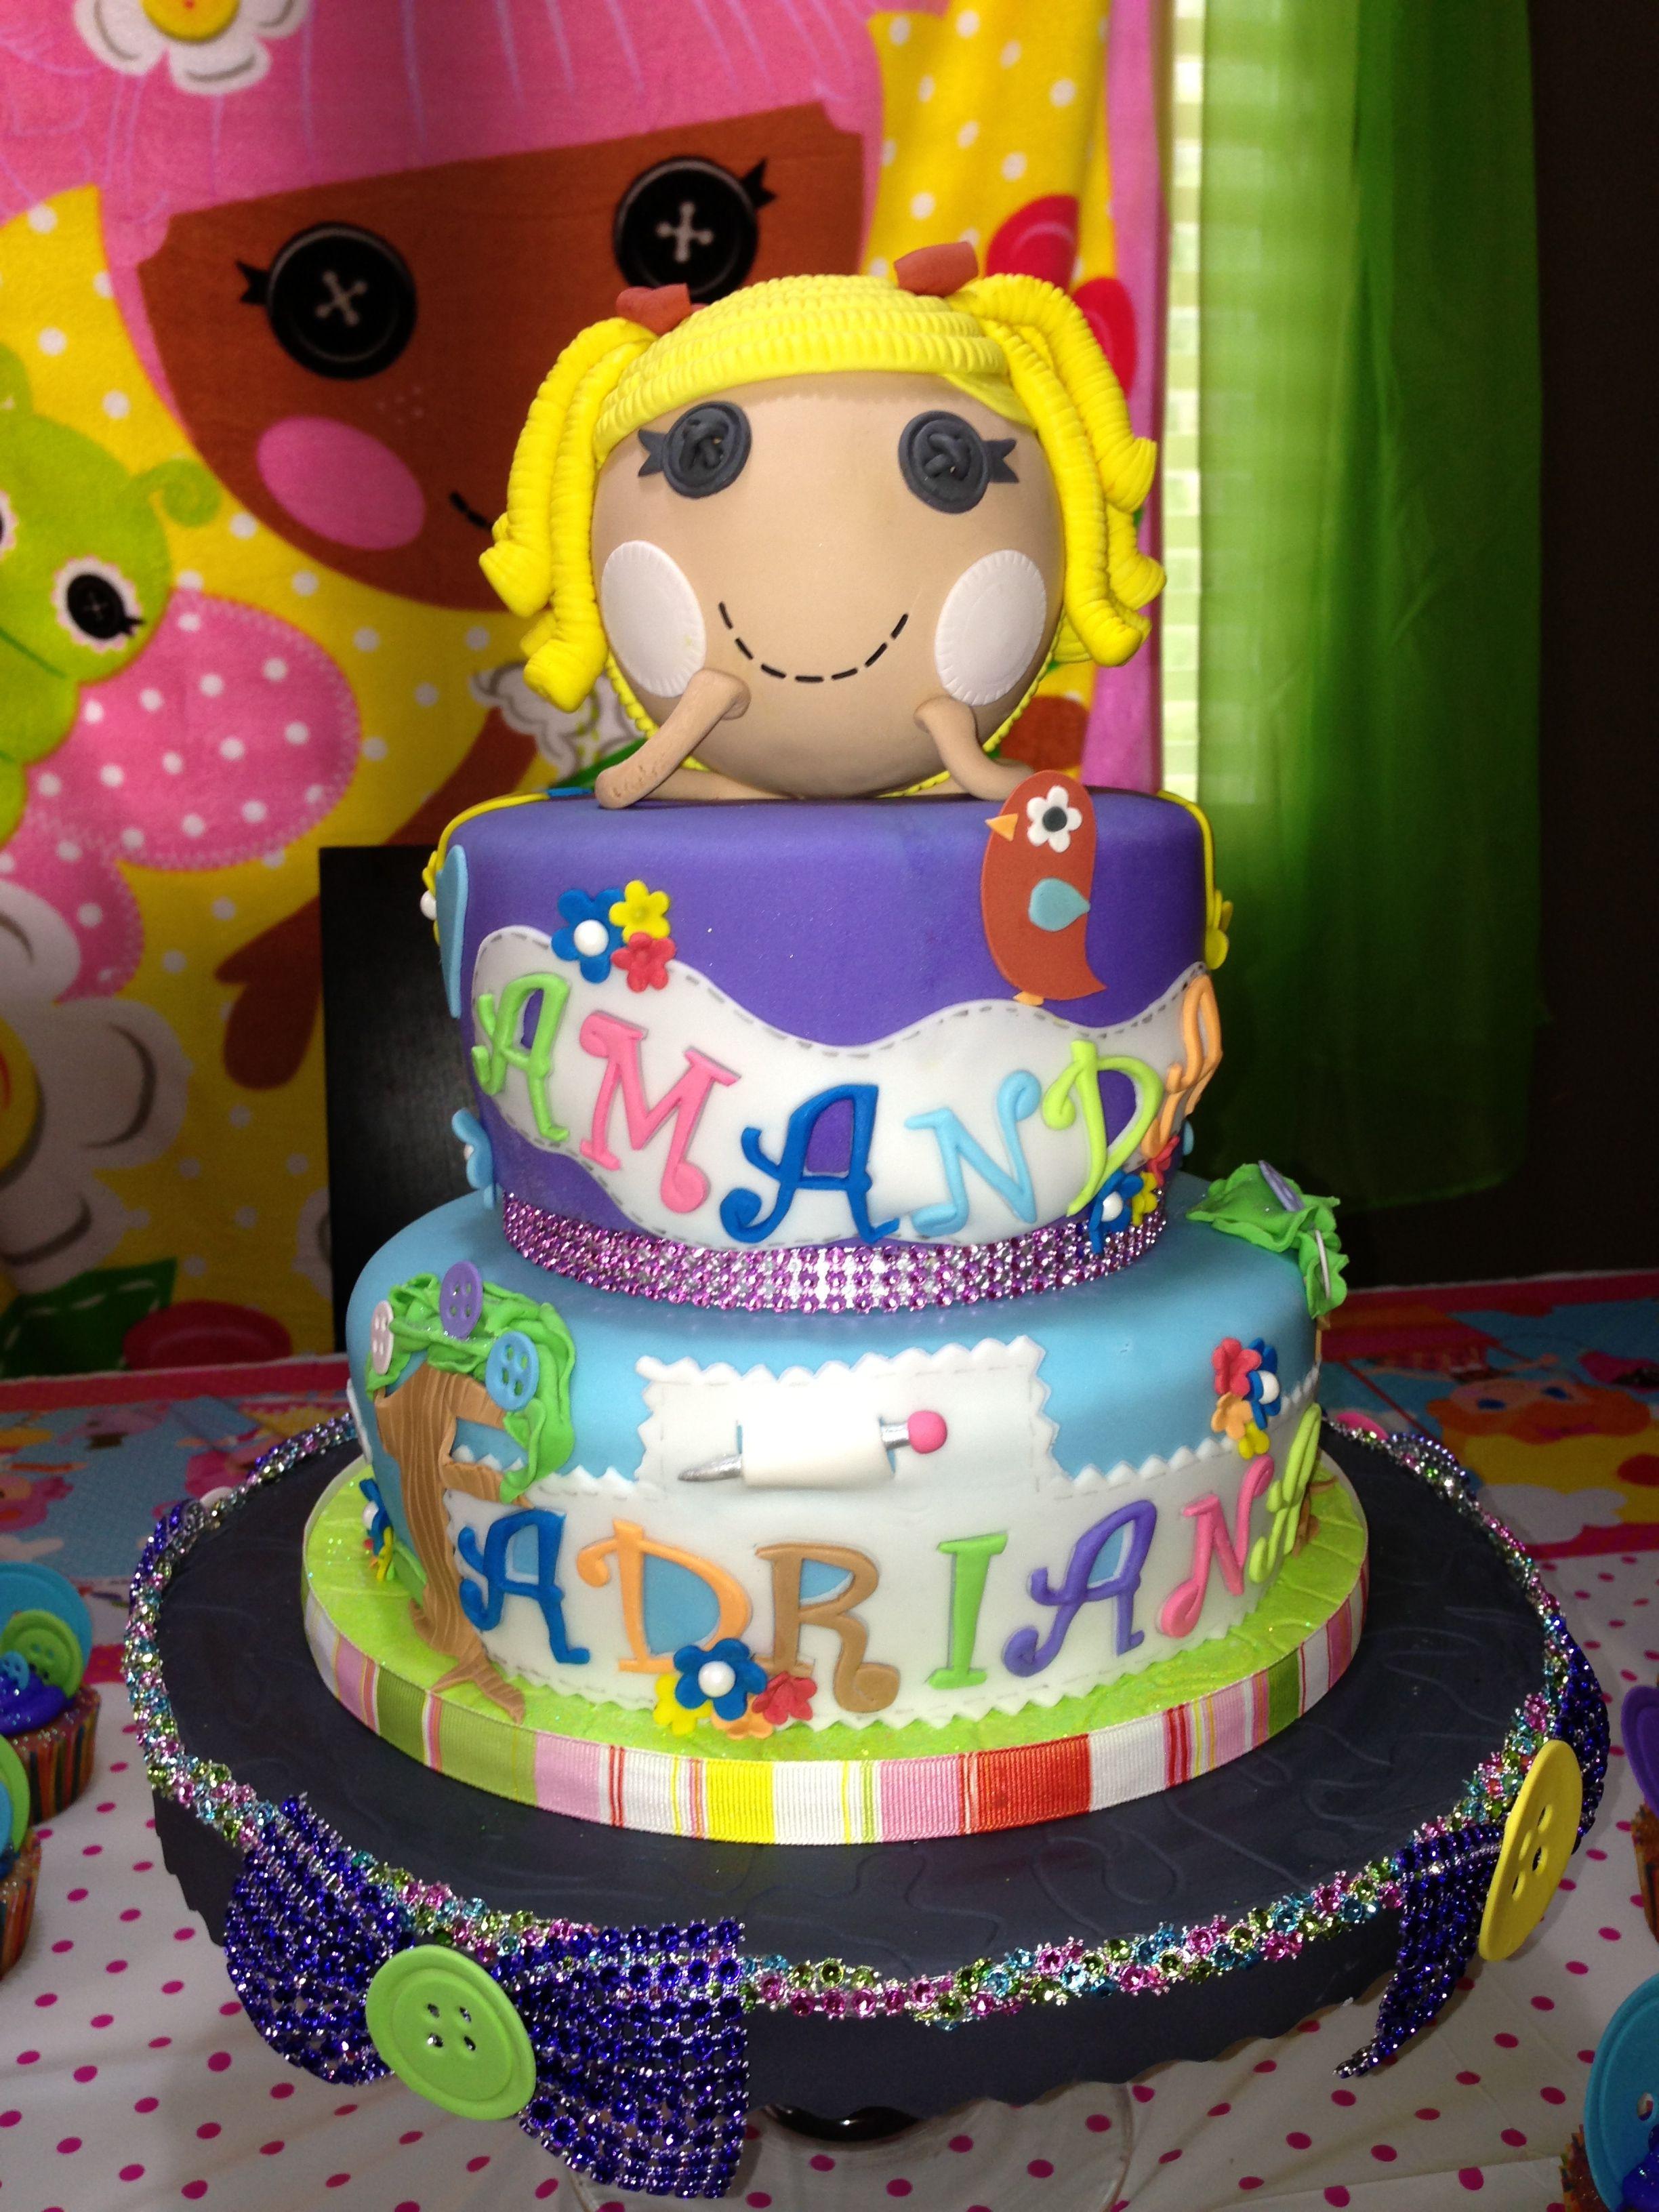 Birthday cake birthday cake cake birthday